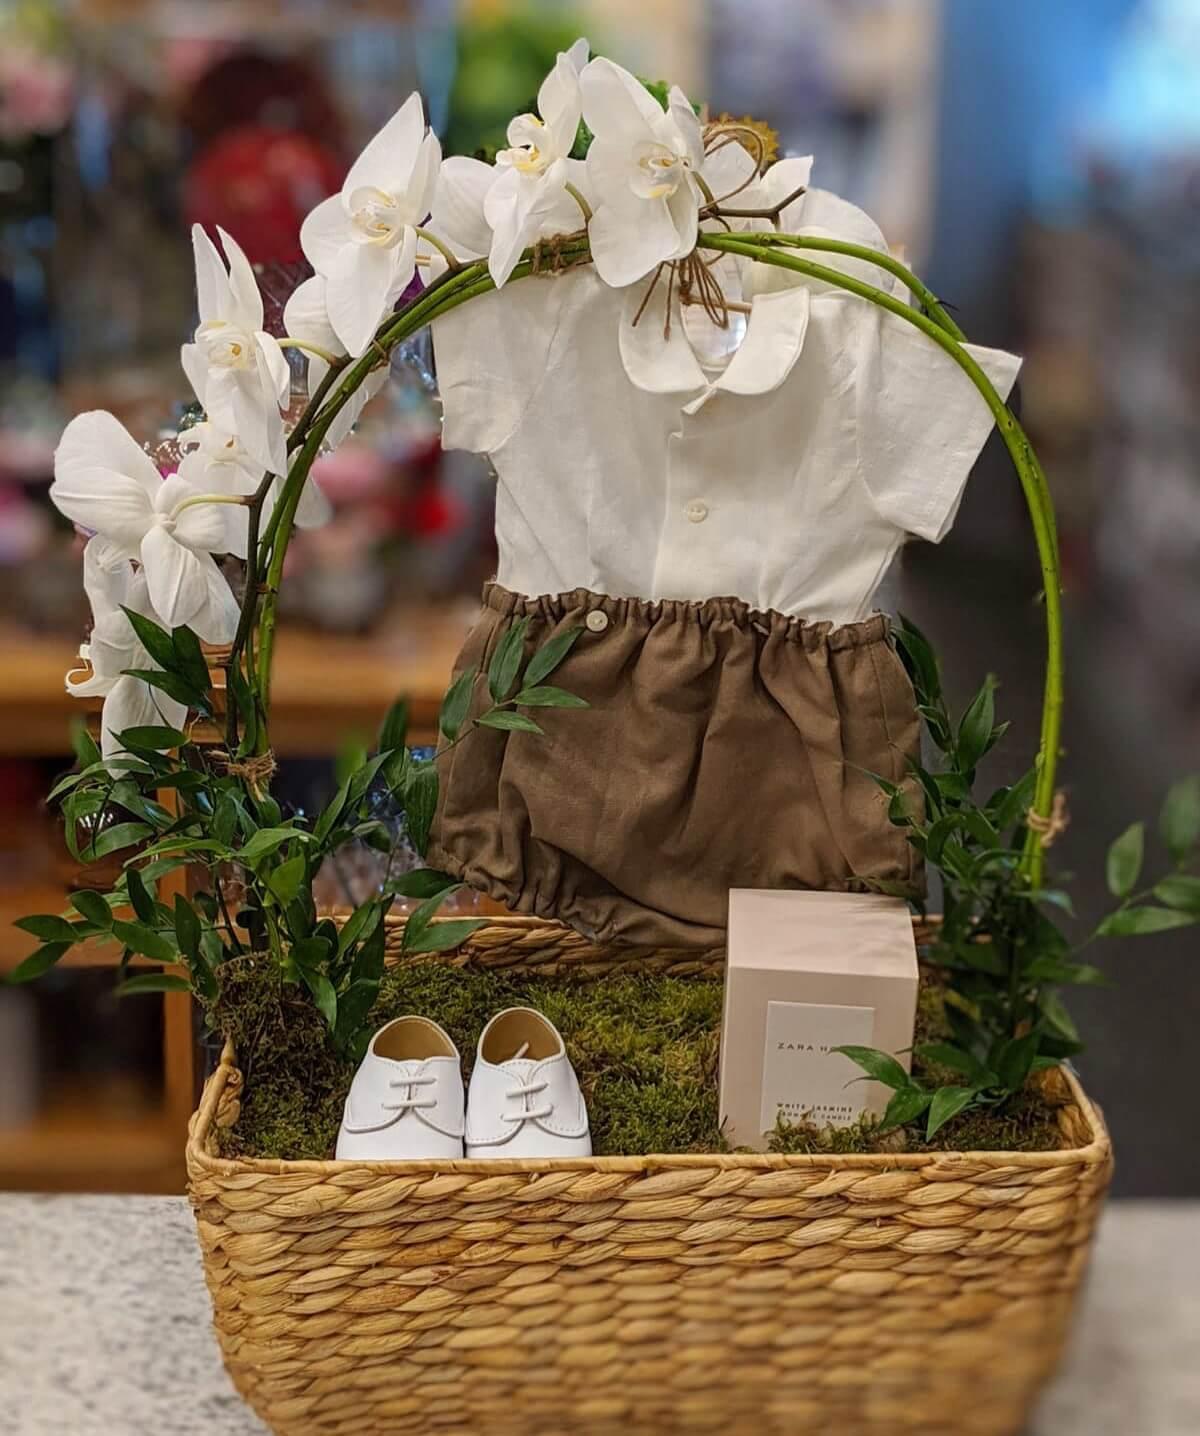 Basket arrangement with baby clothes